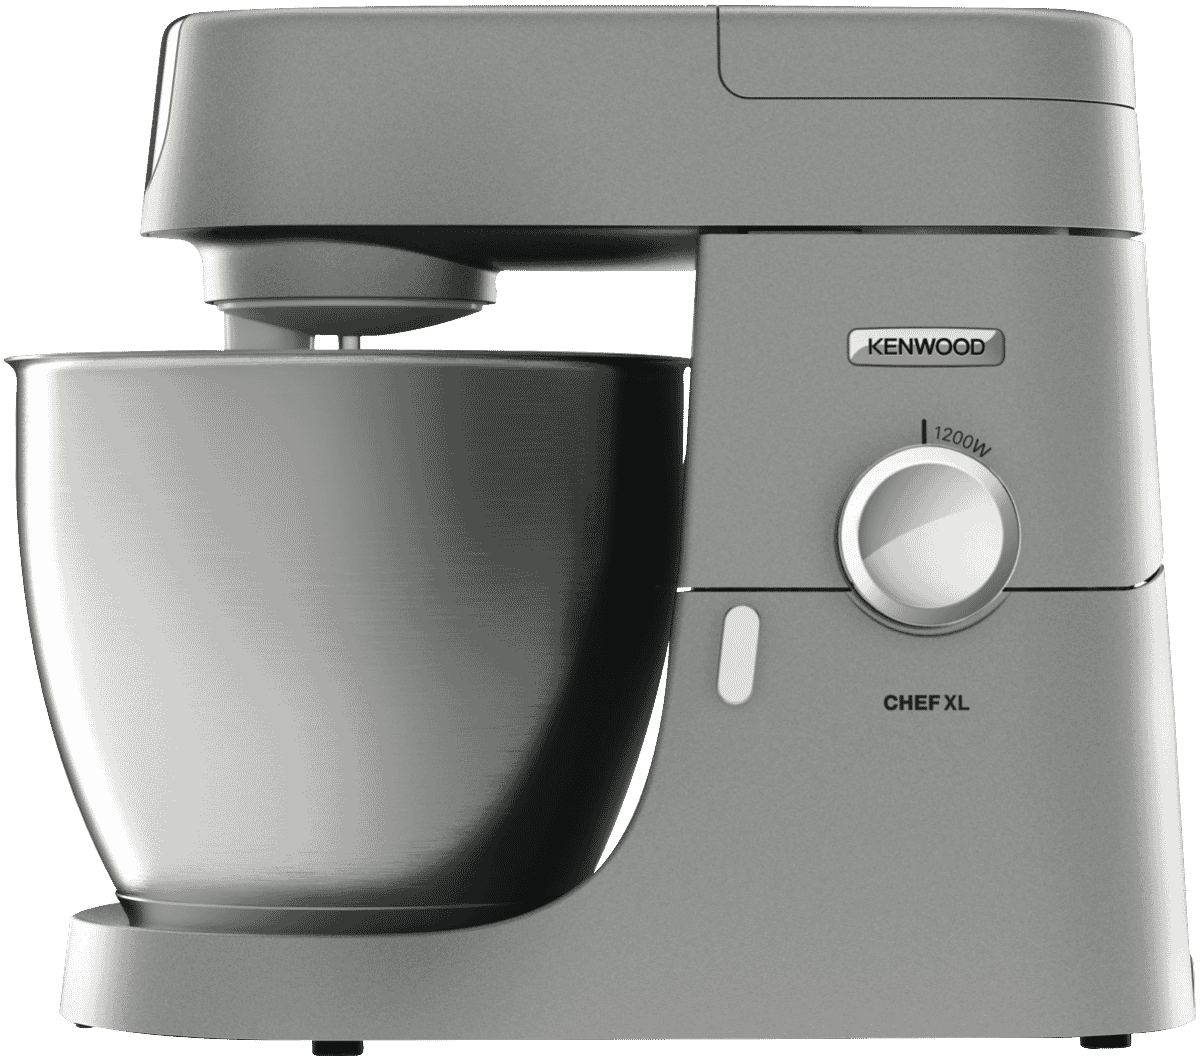 Chef XL Stand Mixer